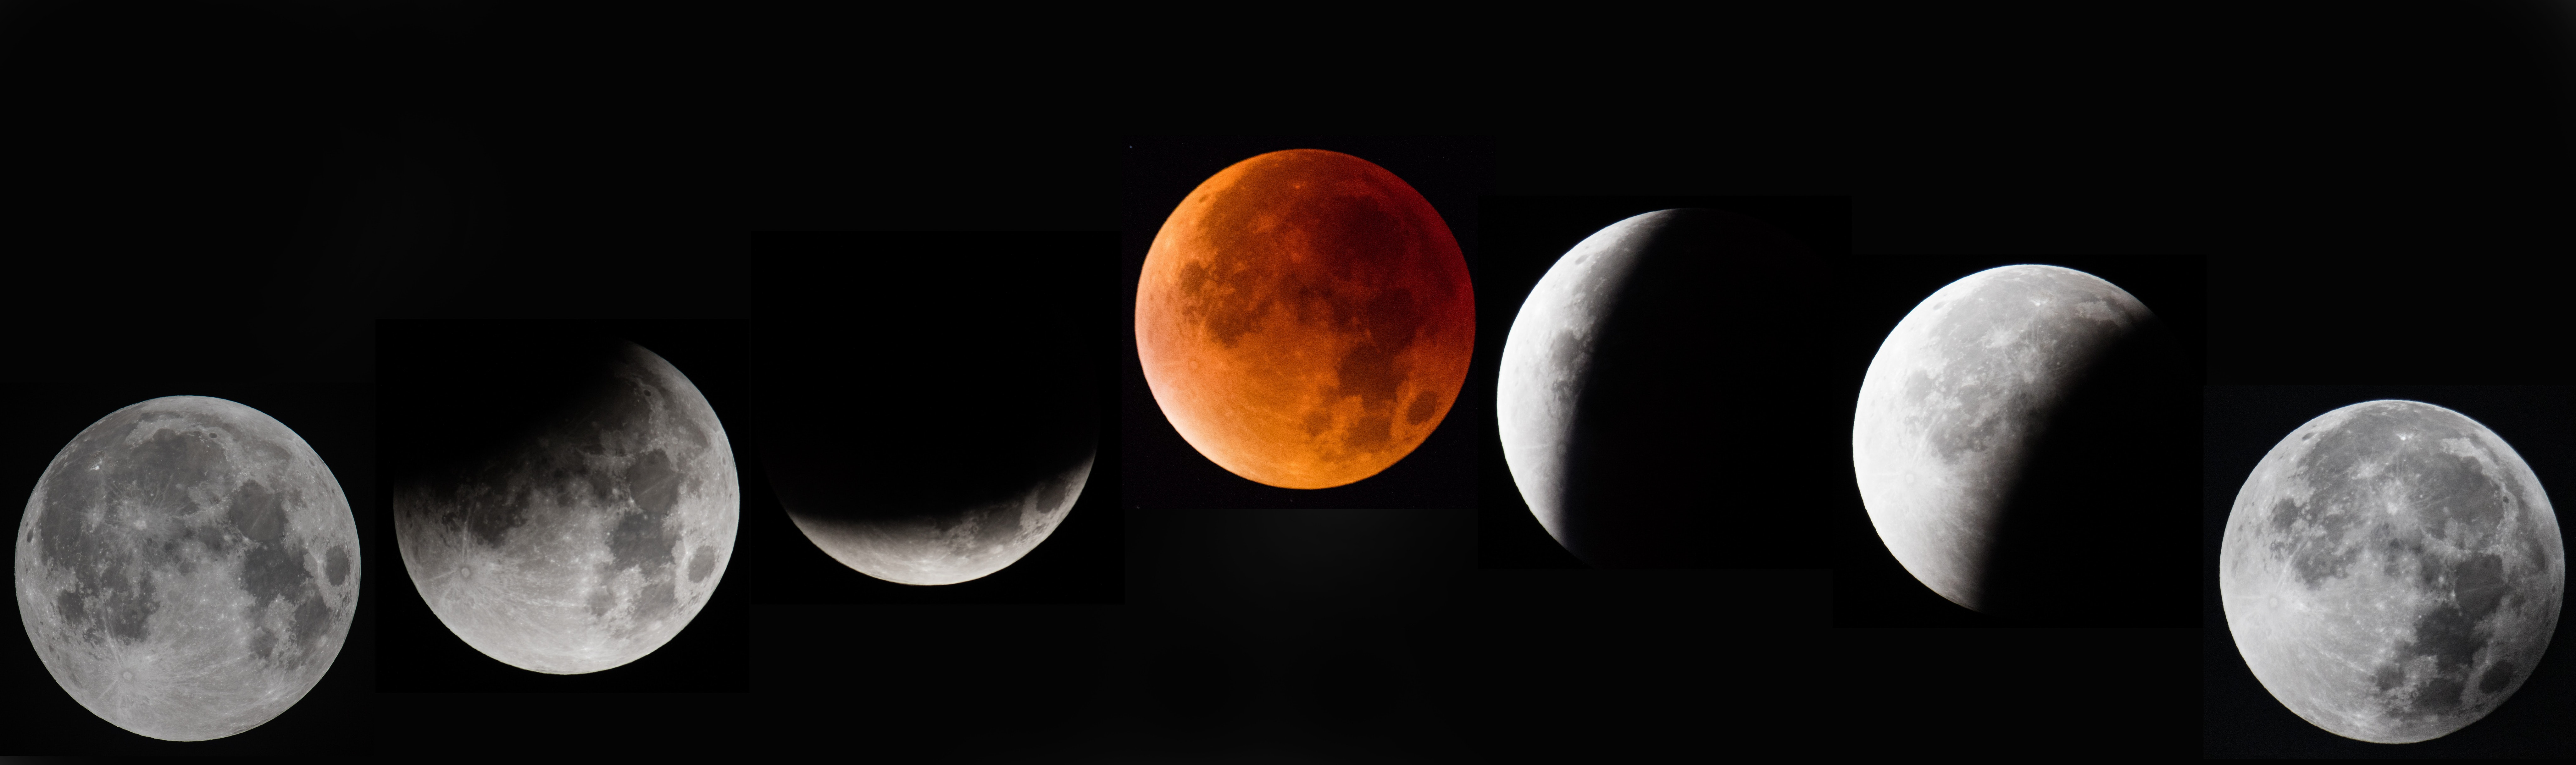 february 7 blood moon astrology